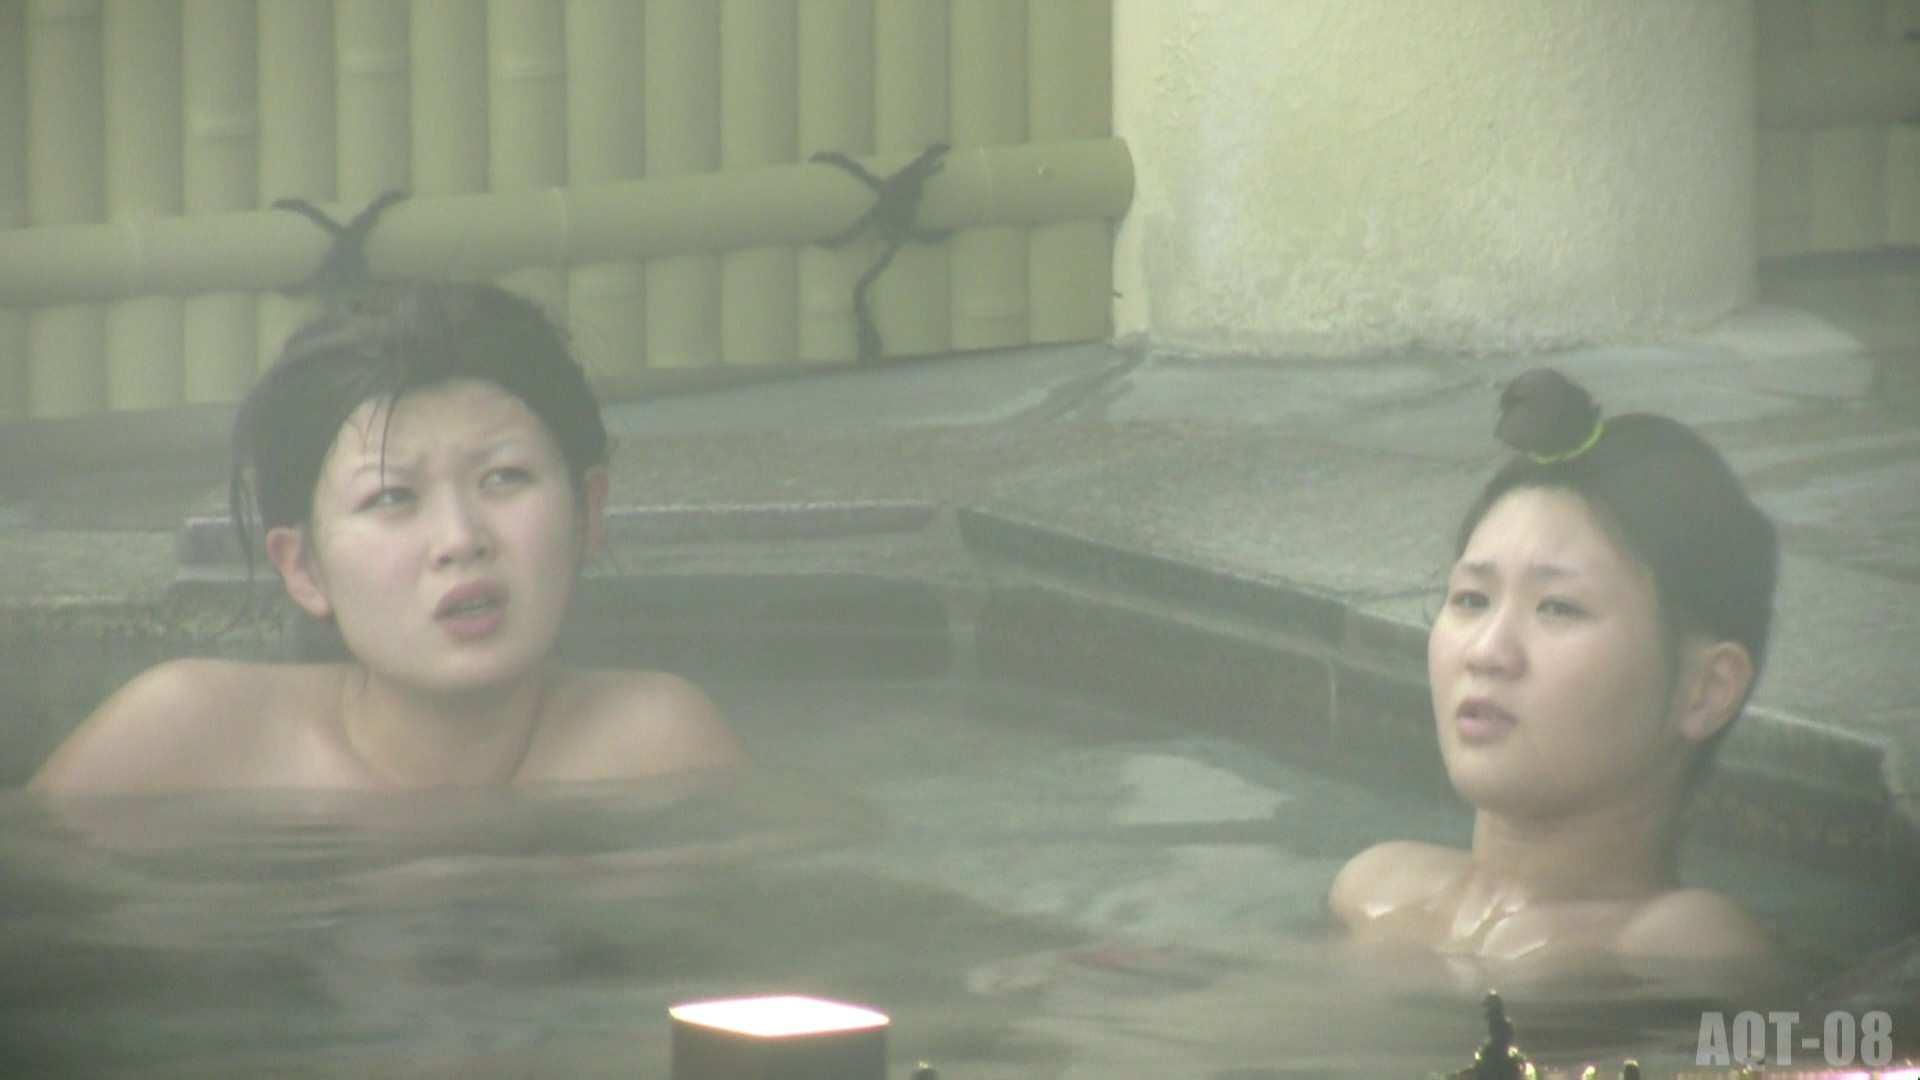 Aquaな露天風呂Vol.777 盗撮   OLエロ画像  78PICs 31